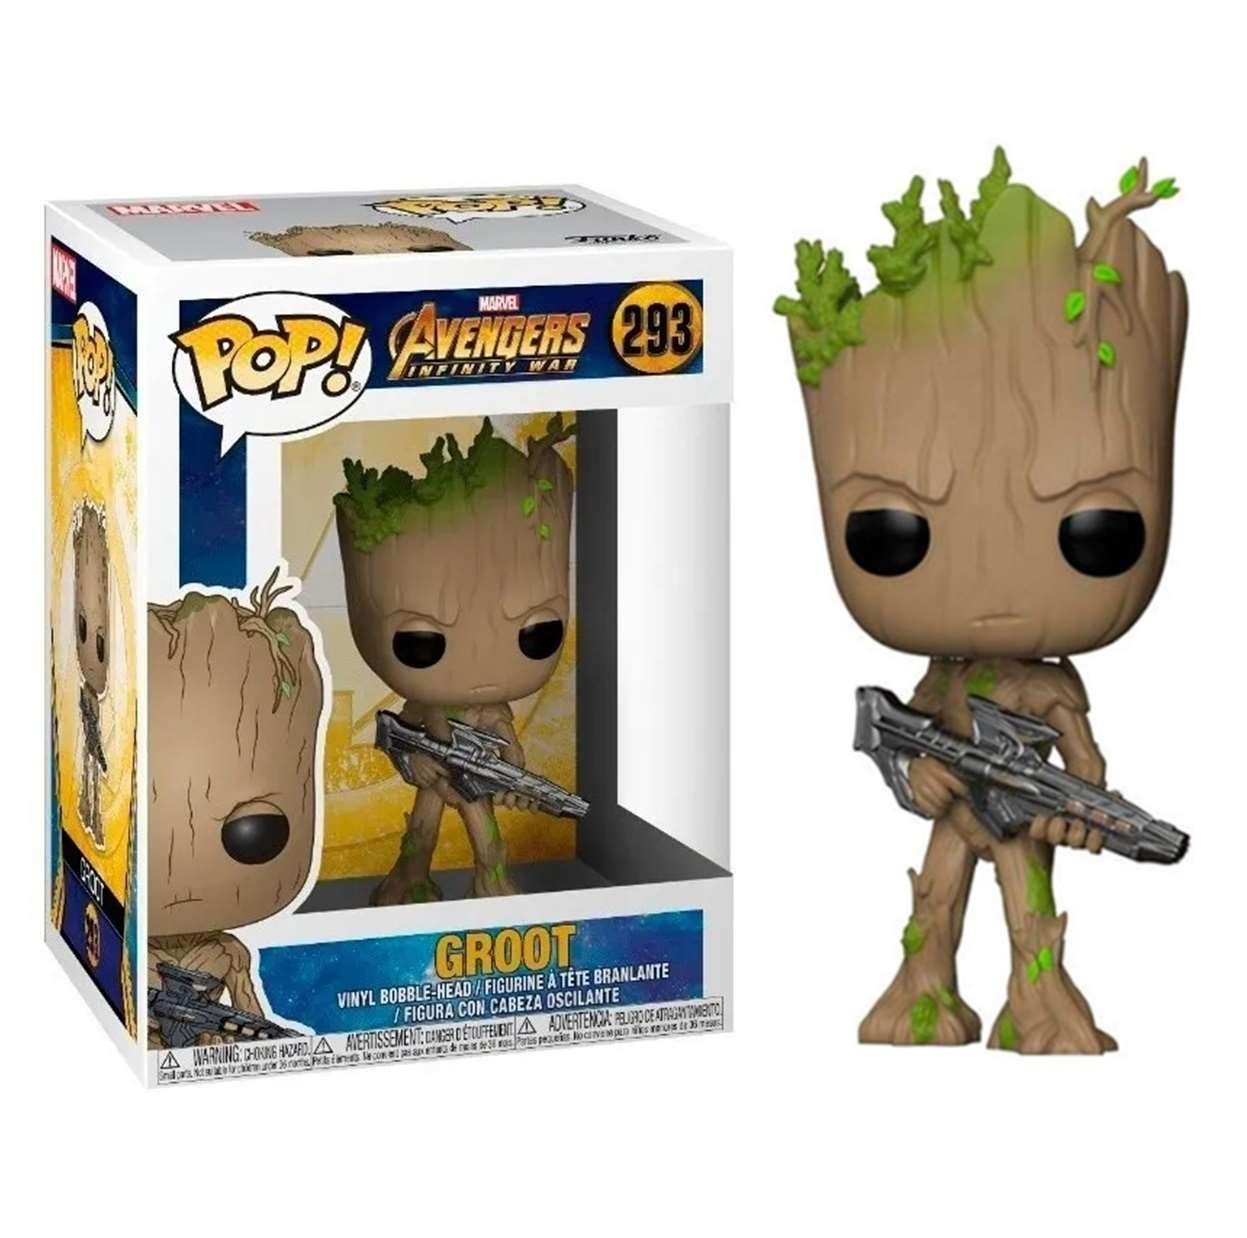 Groot #293 Figura Avengers Infinity War Funko Pop!